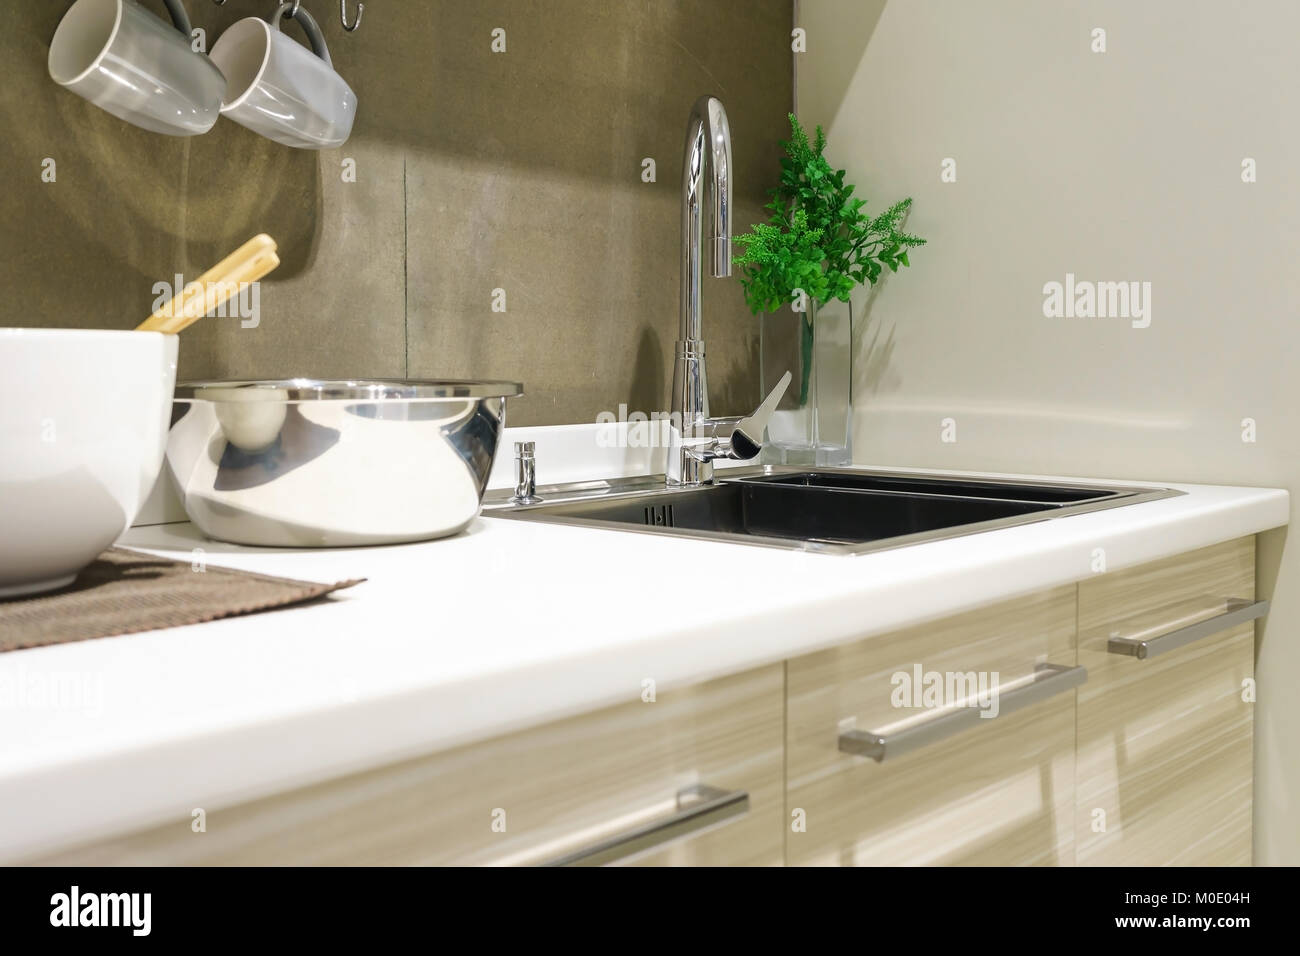 Modern White Kitchen Countertop With White Granite Custom Counter Stock Photo Alamy